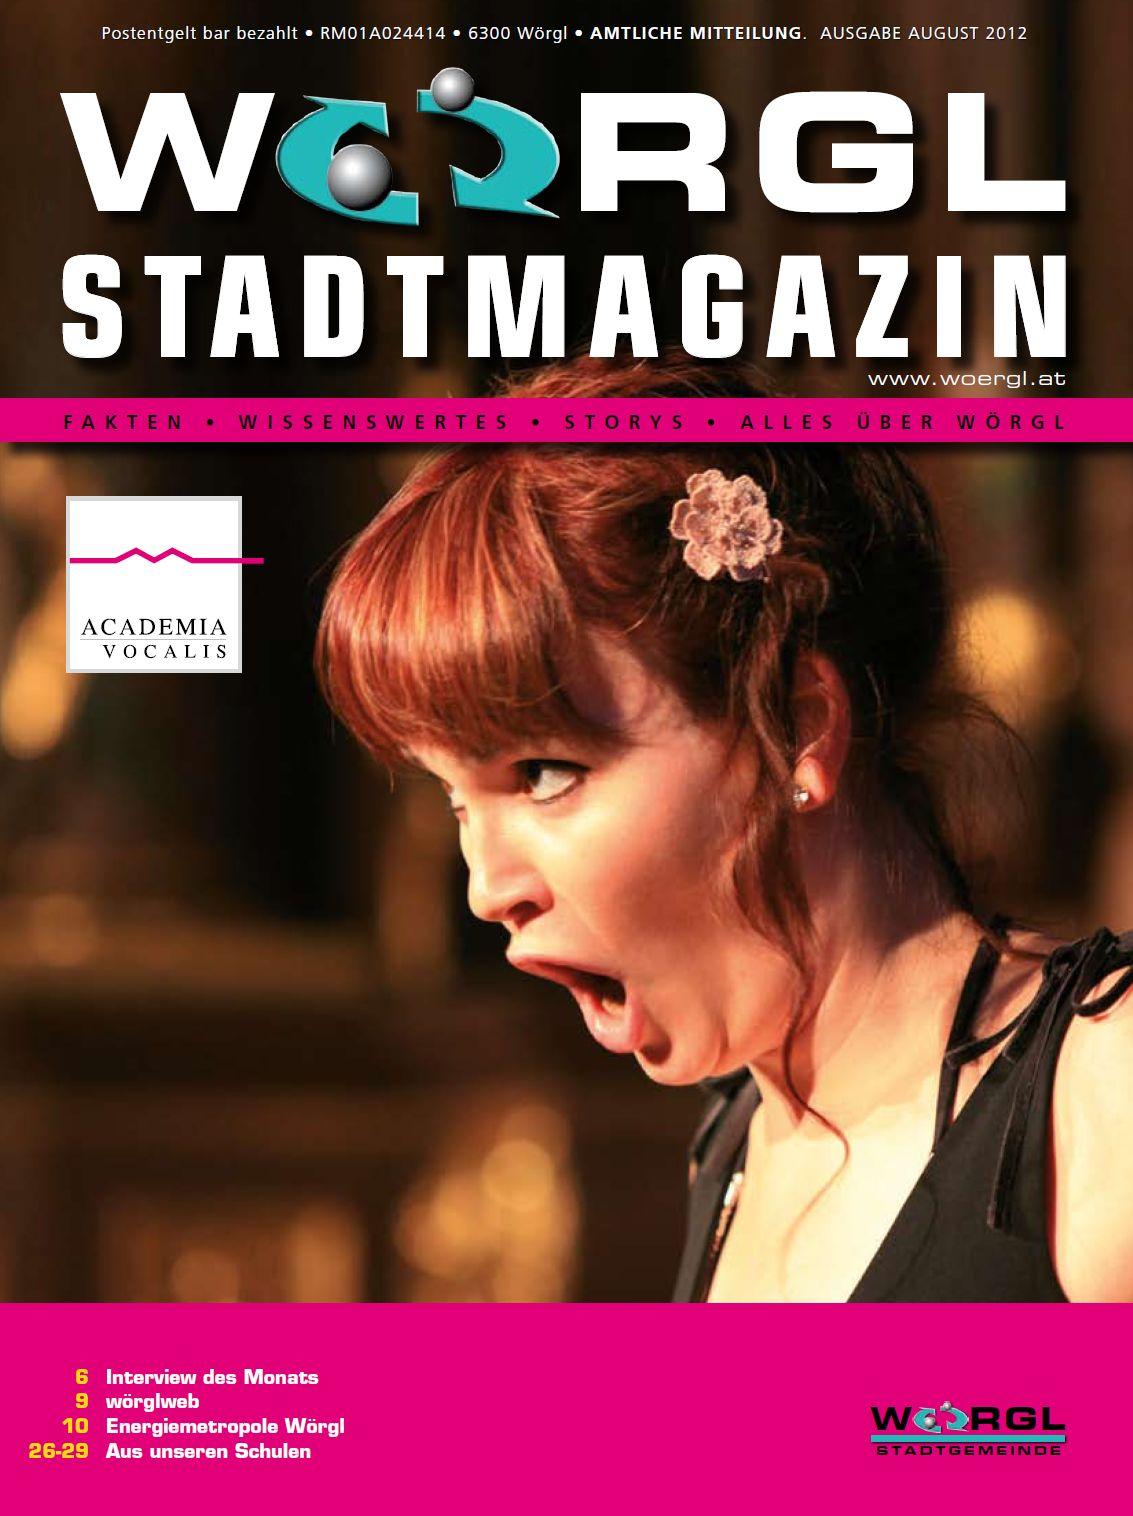 Wörgler Stadtmagazin August